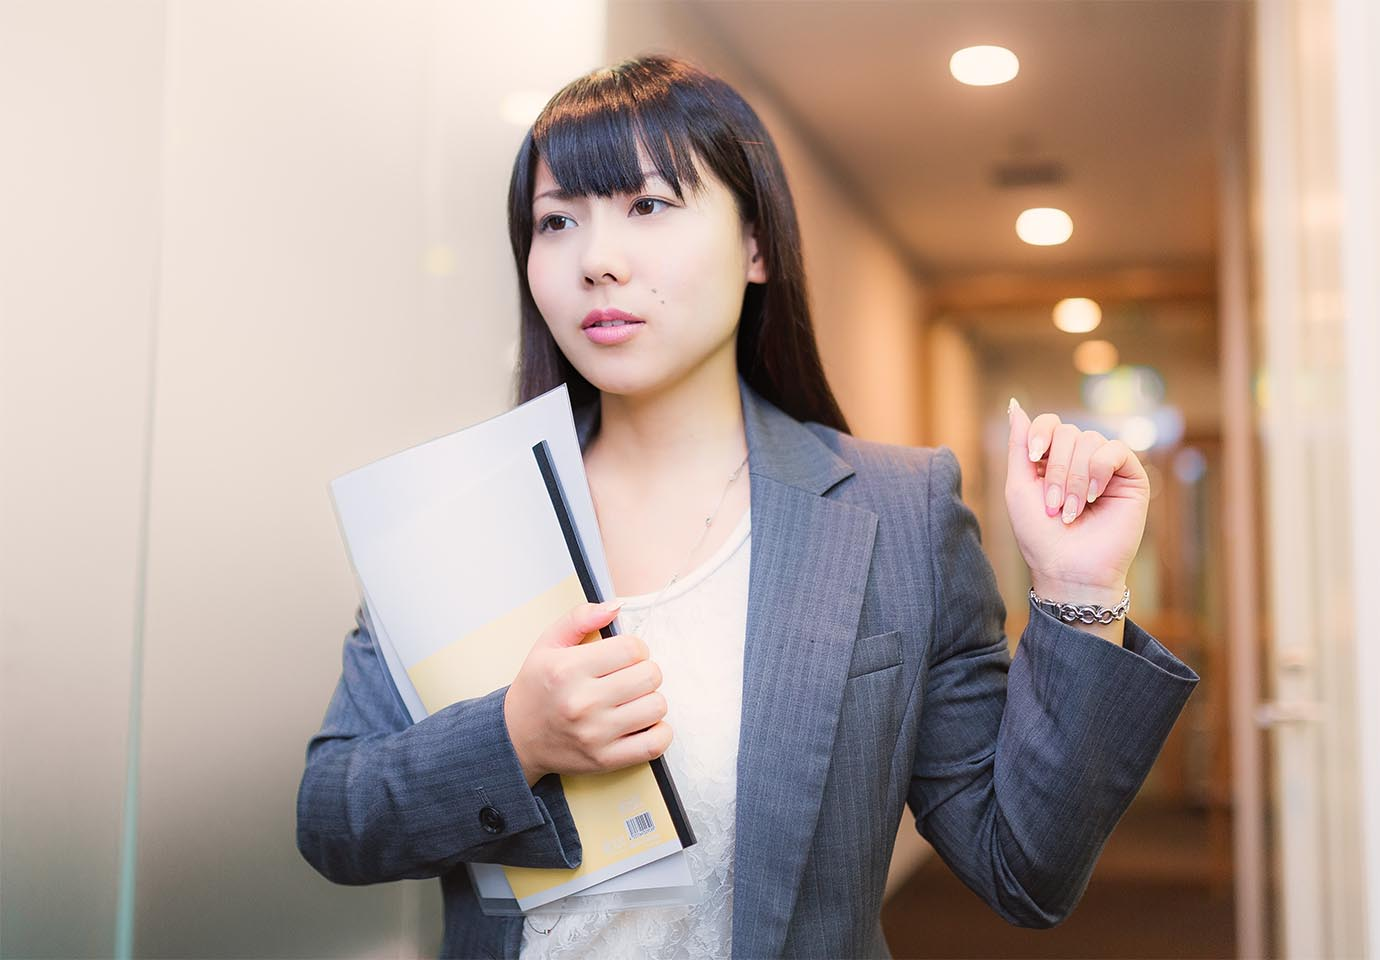 business-person-break-time